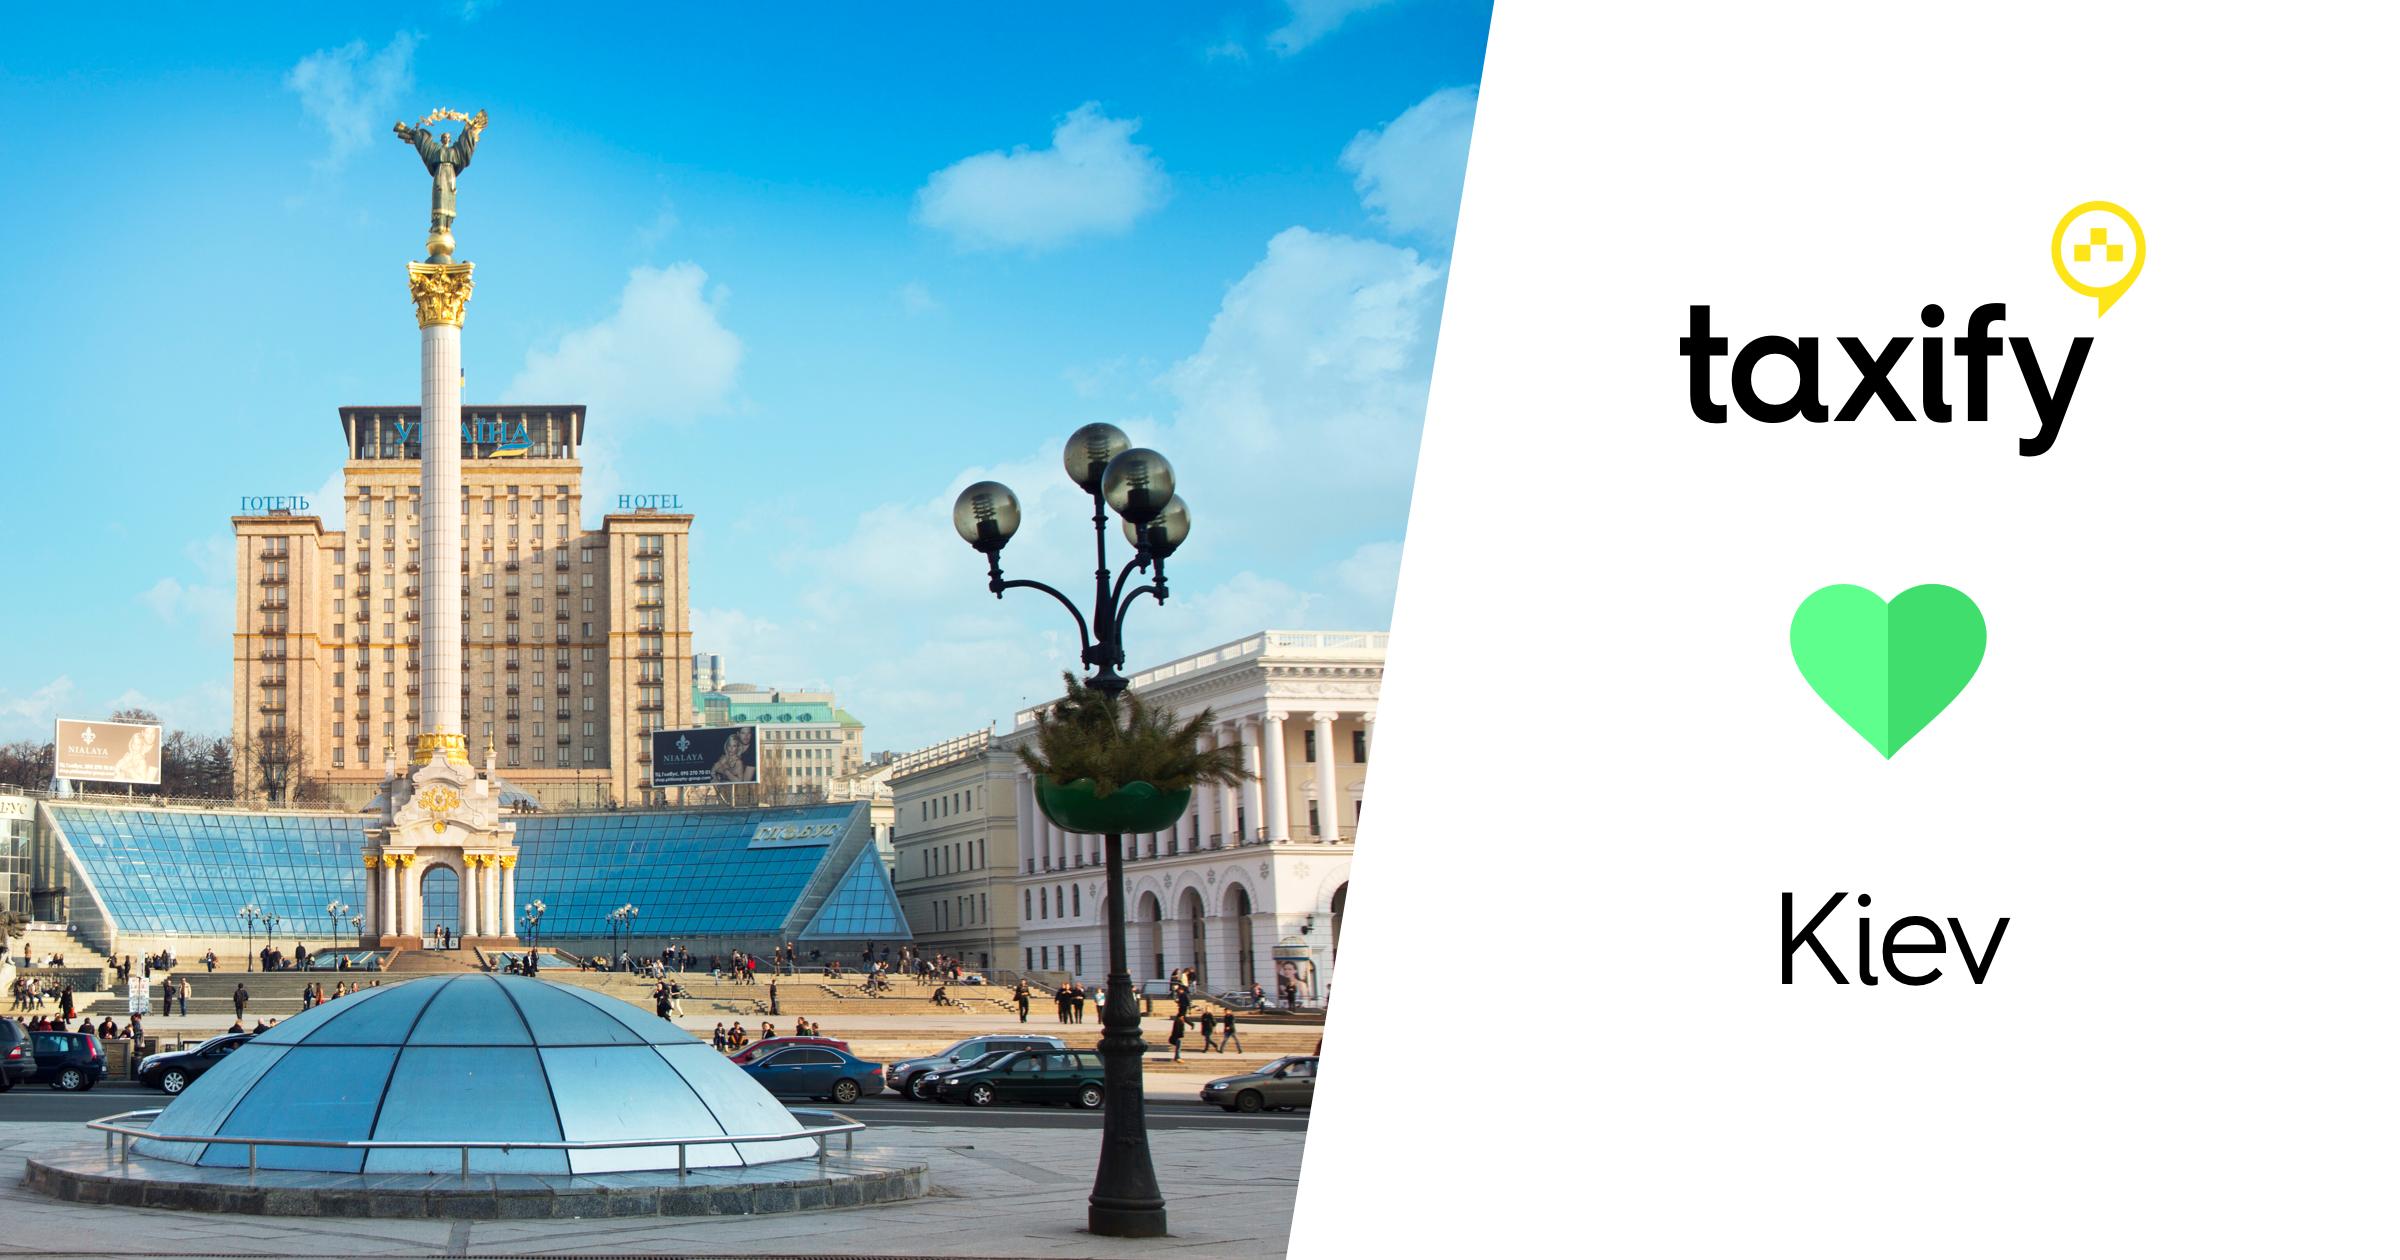 ВУкраинском государстве запускают эстонский сервис заказа Taxify